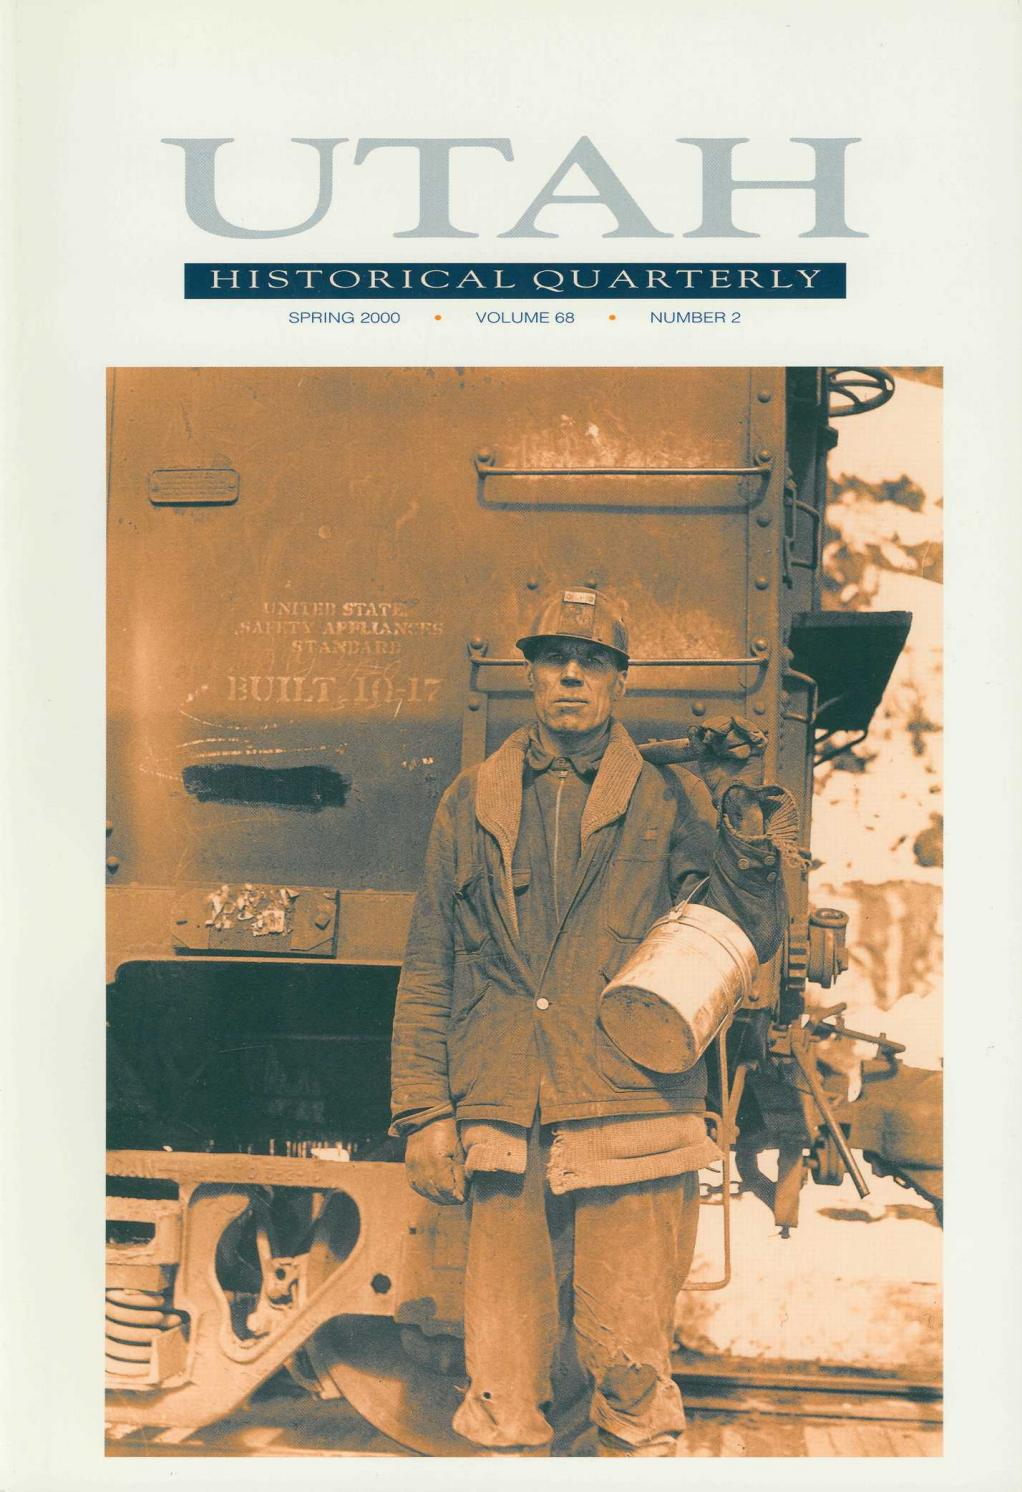 Utah Historical Quarterly, Volume 68, Number 2, 2000 by Utah